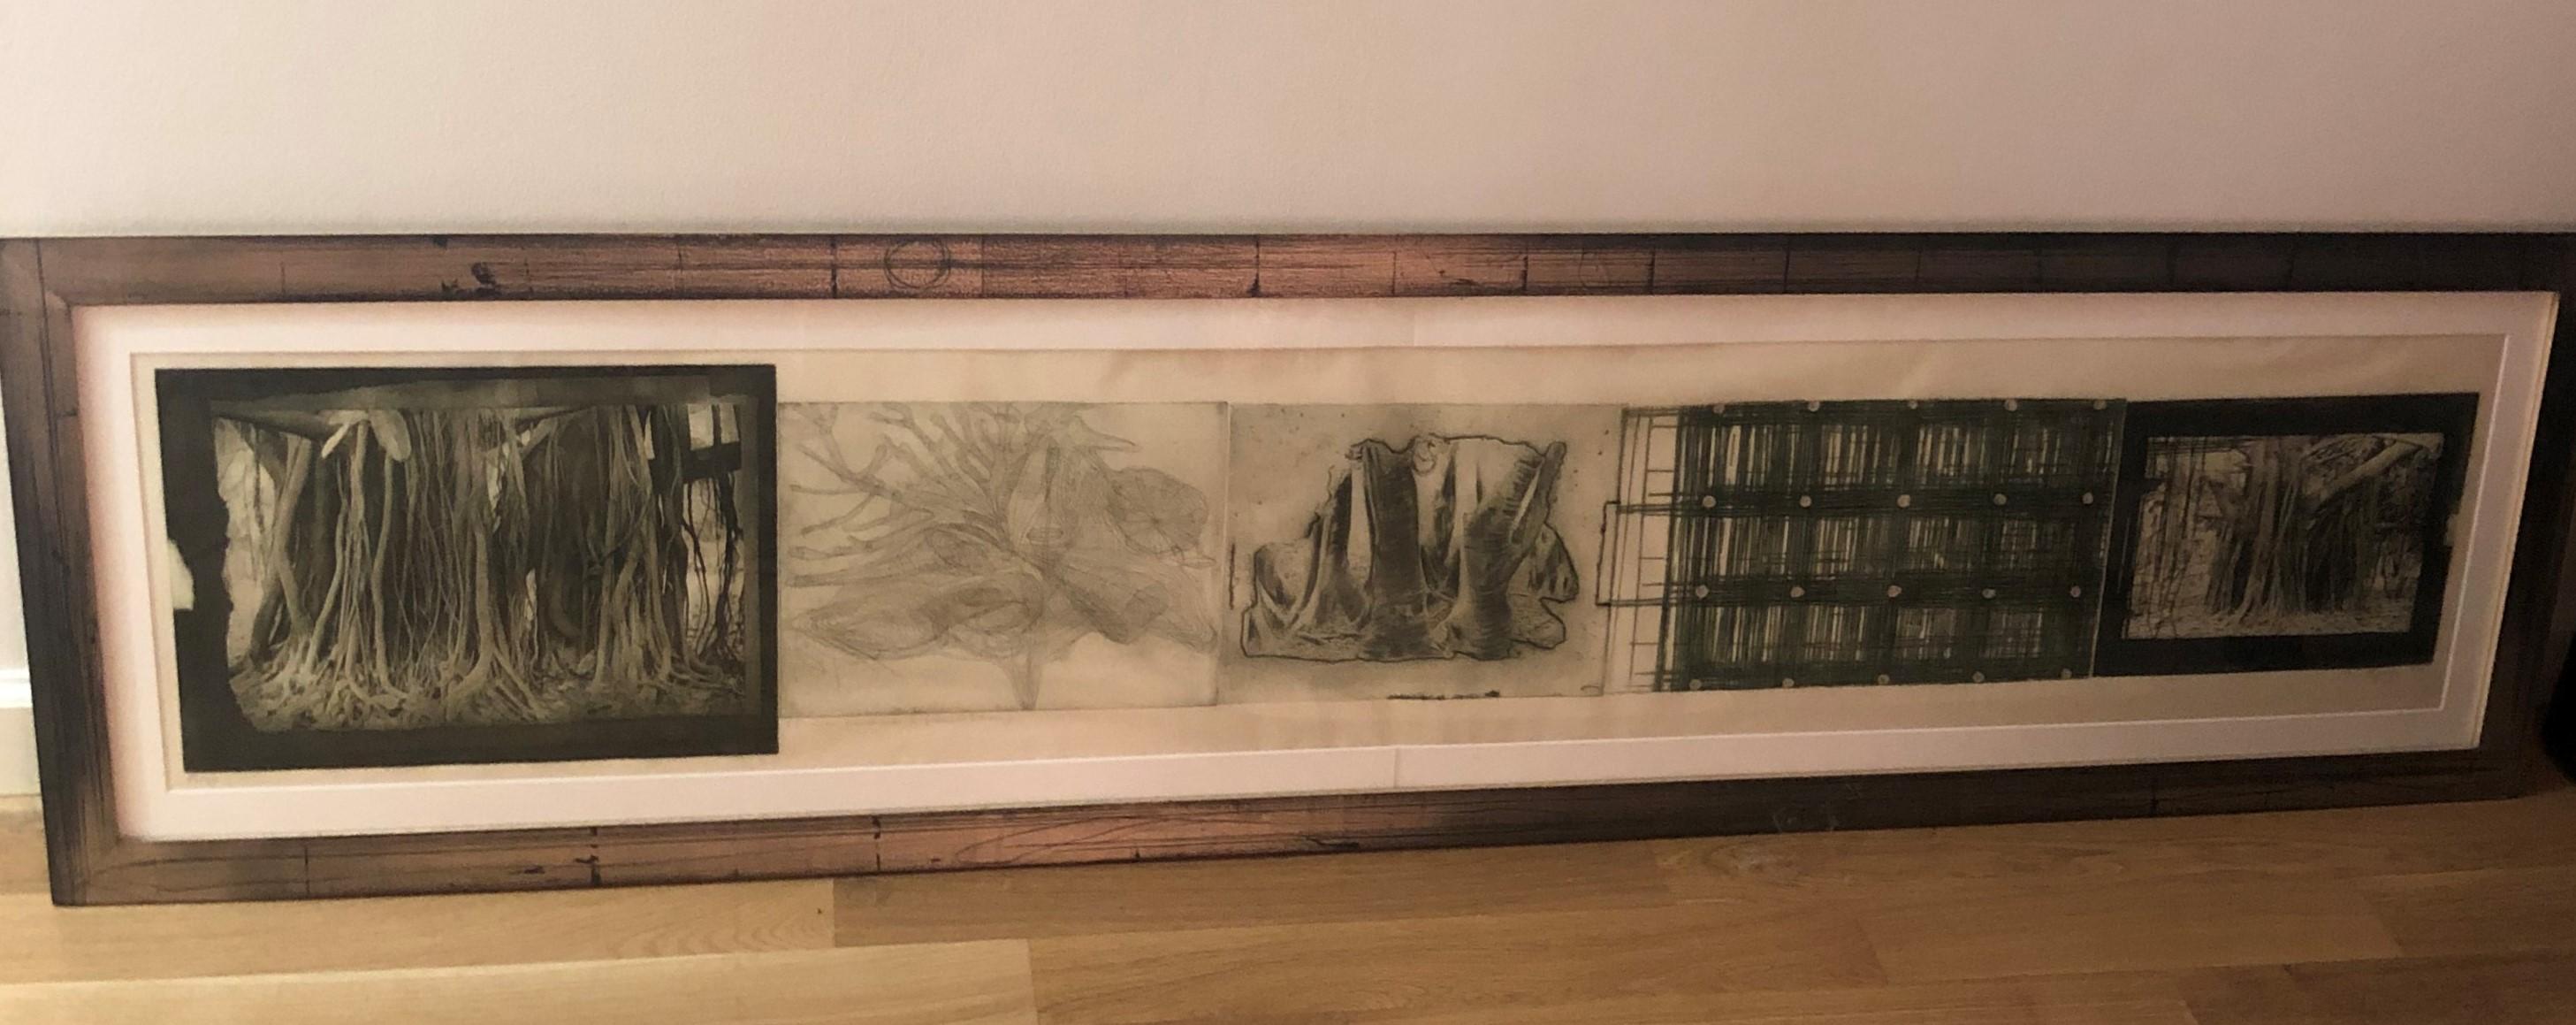 Ipiabuera for Oscar artwork by Judy Pfaff - art listed for sale on Artplode